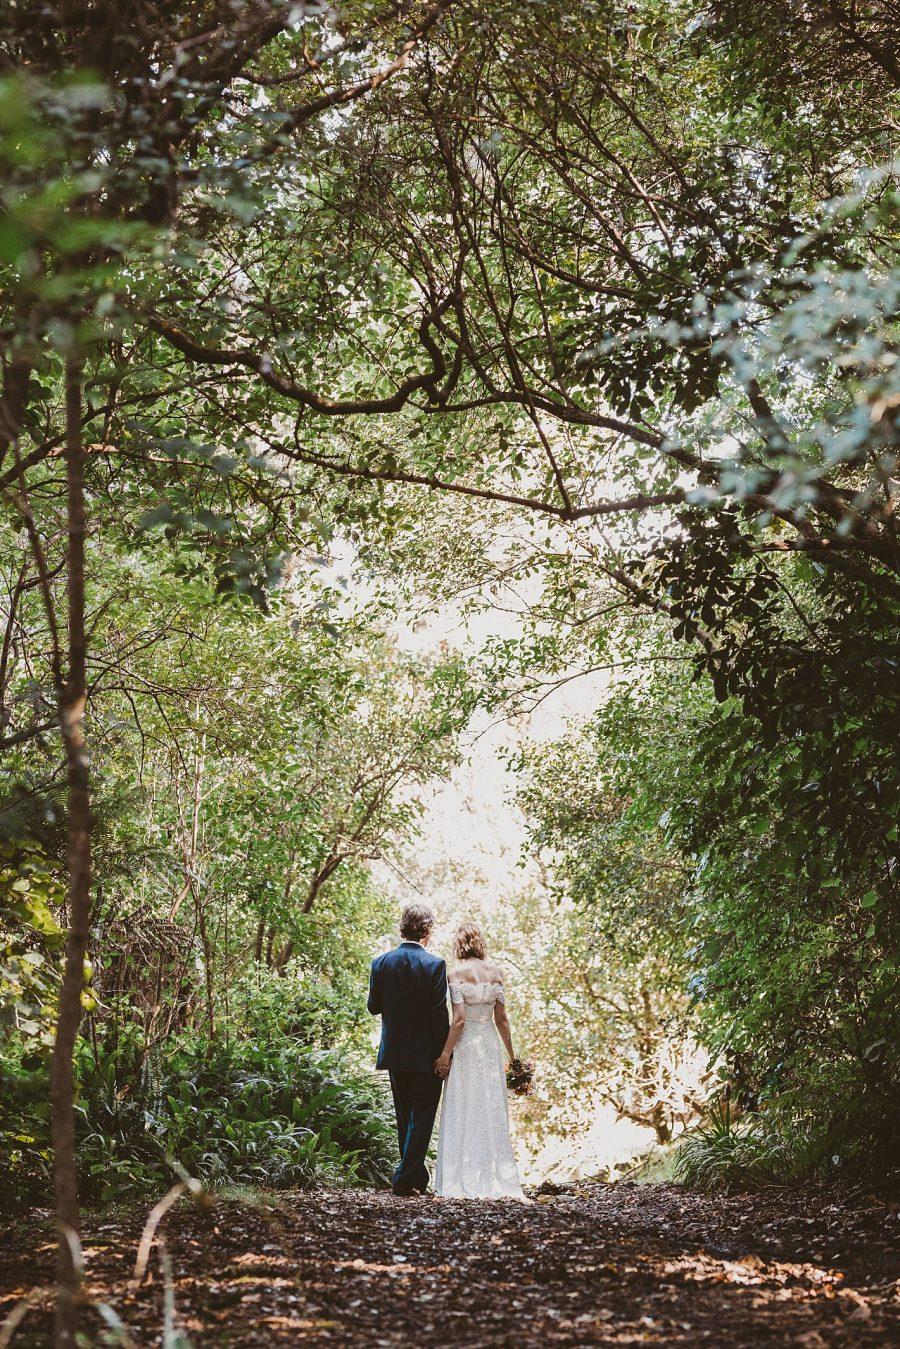 New Zealand Waihi Beach Wedding Bush walk